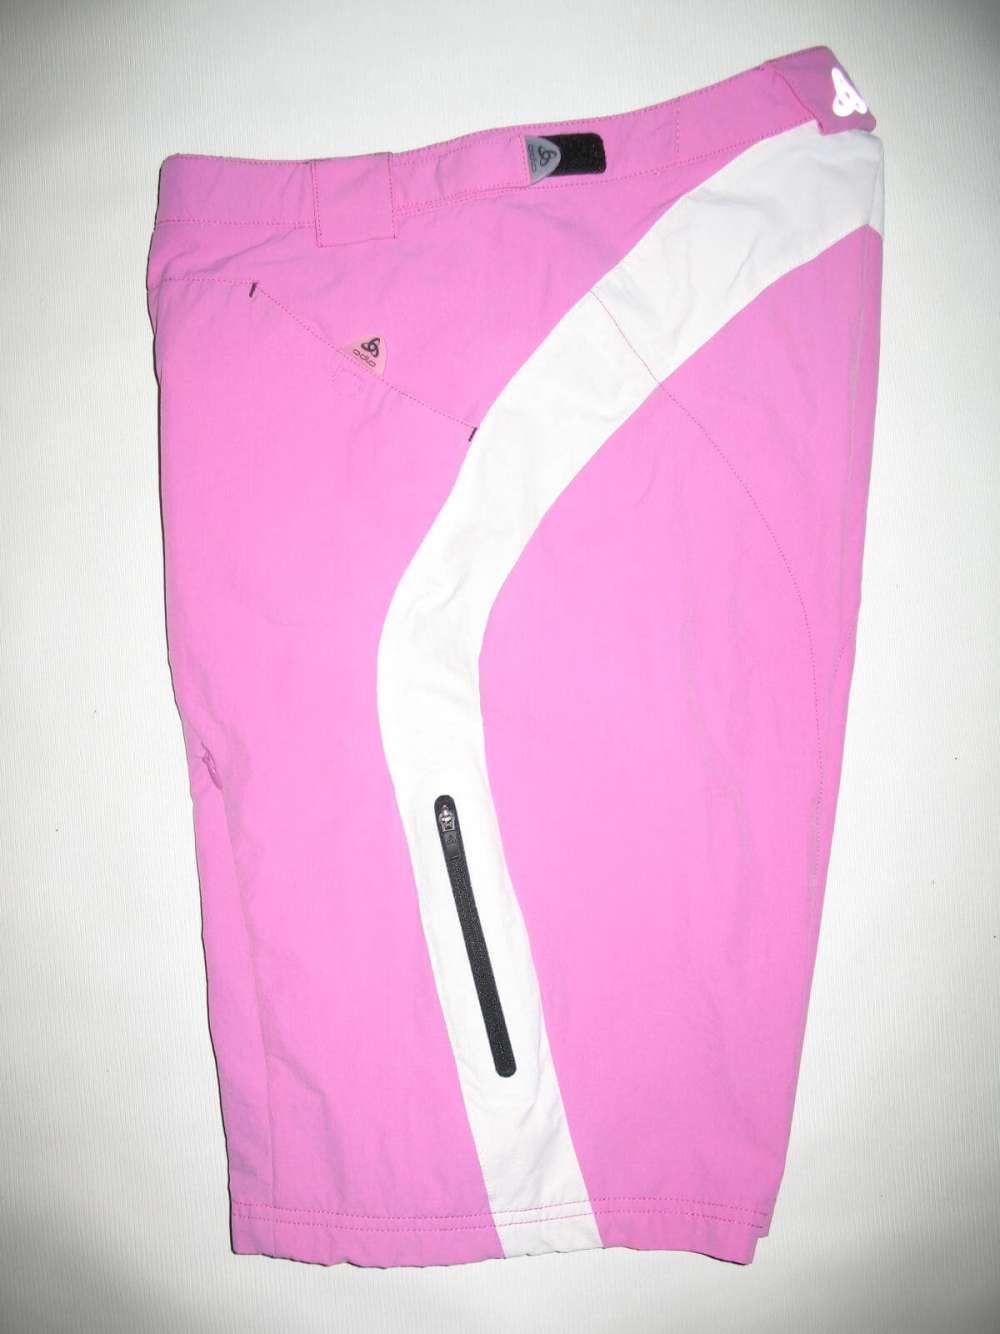 Шорты ODLO bike shorts lady (размер S) - 7